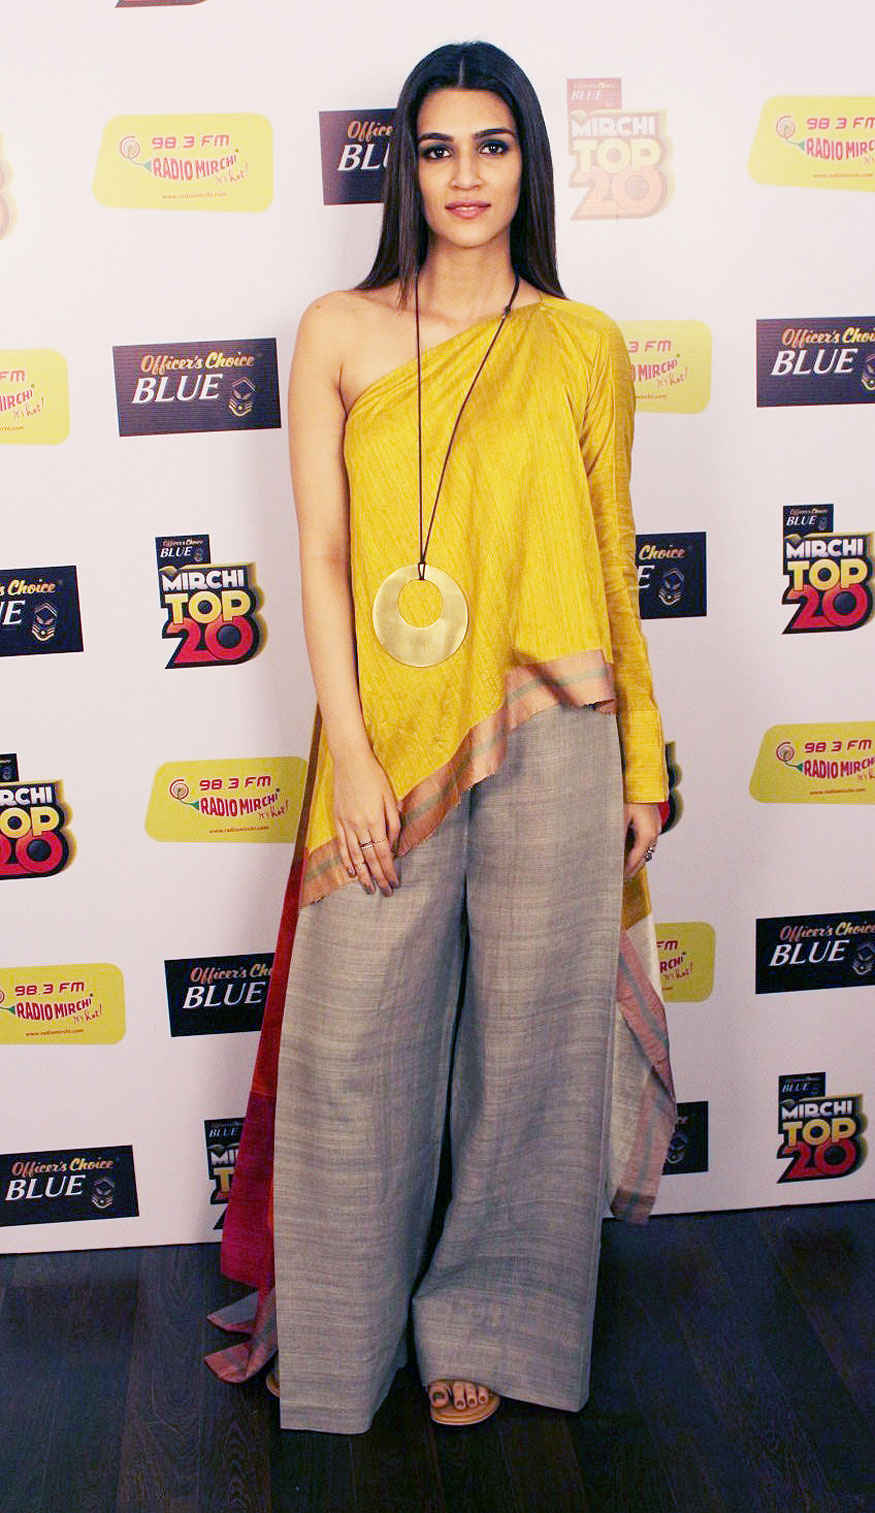 Ayushmann Khurrana and Kriti Sanon 98.3 Radio Mirchi Fm To Promote Film Bareilly Ki Barfi